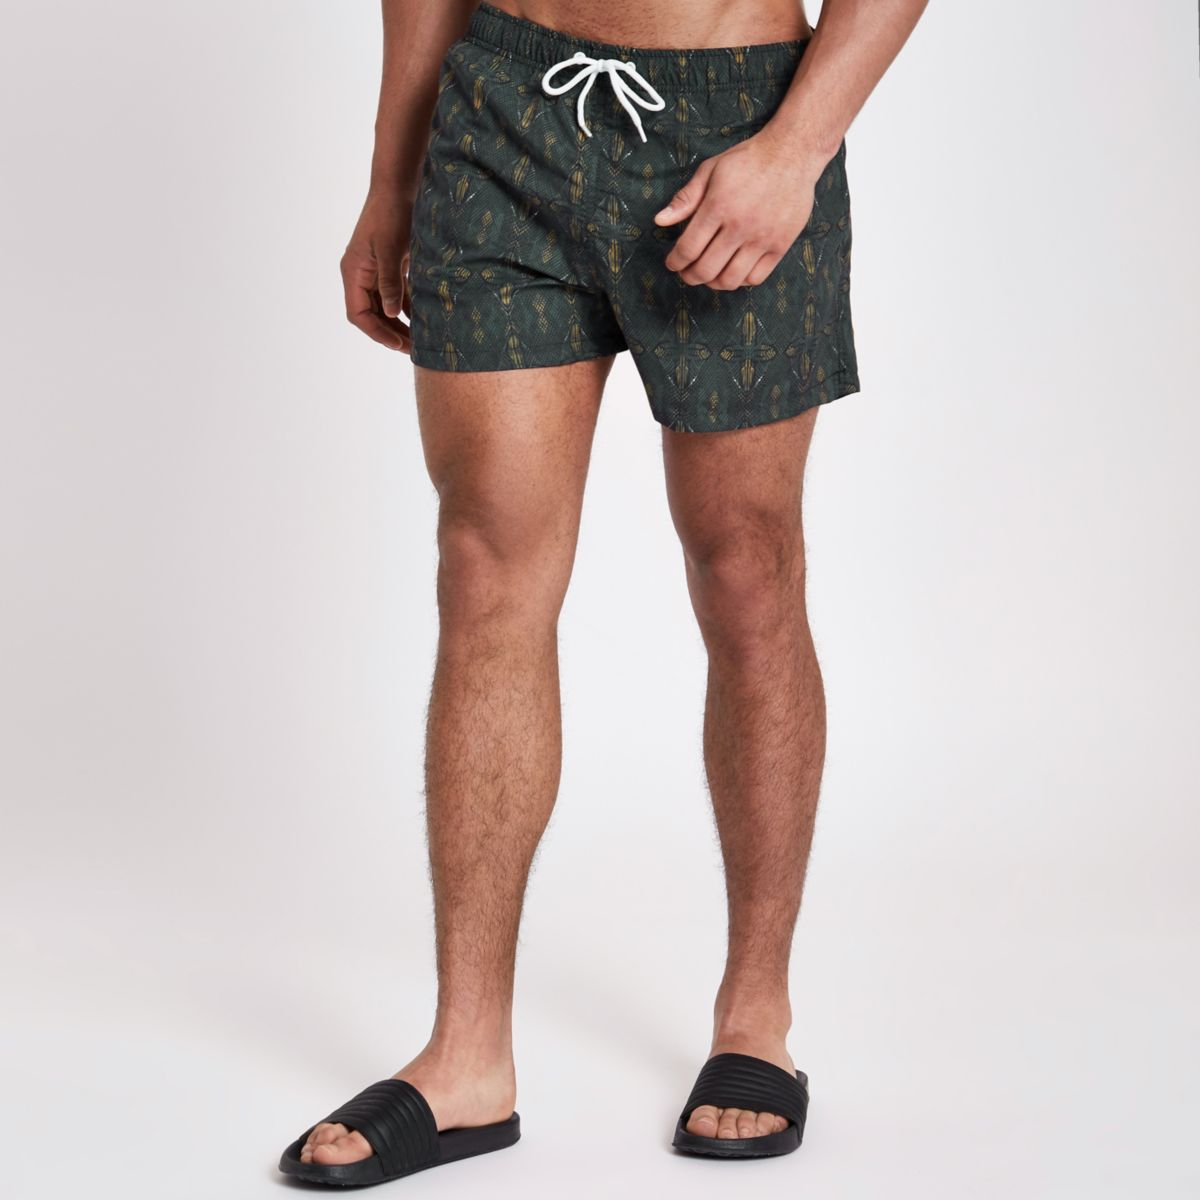 Brown aztec print short swim trunks